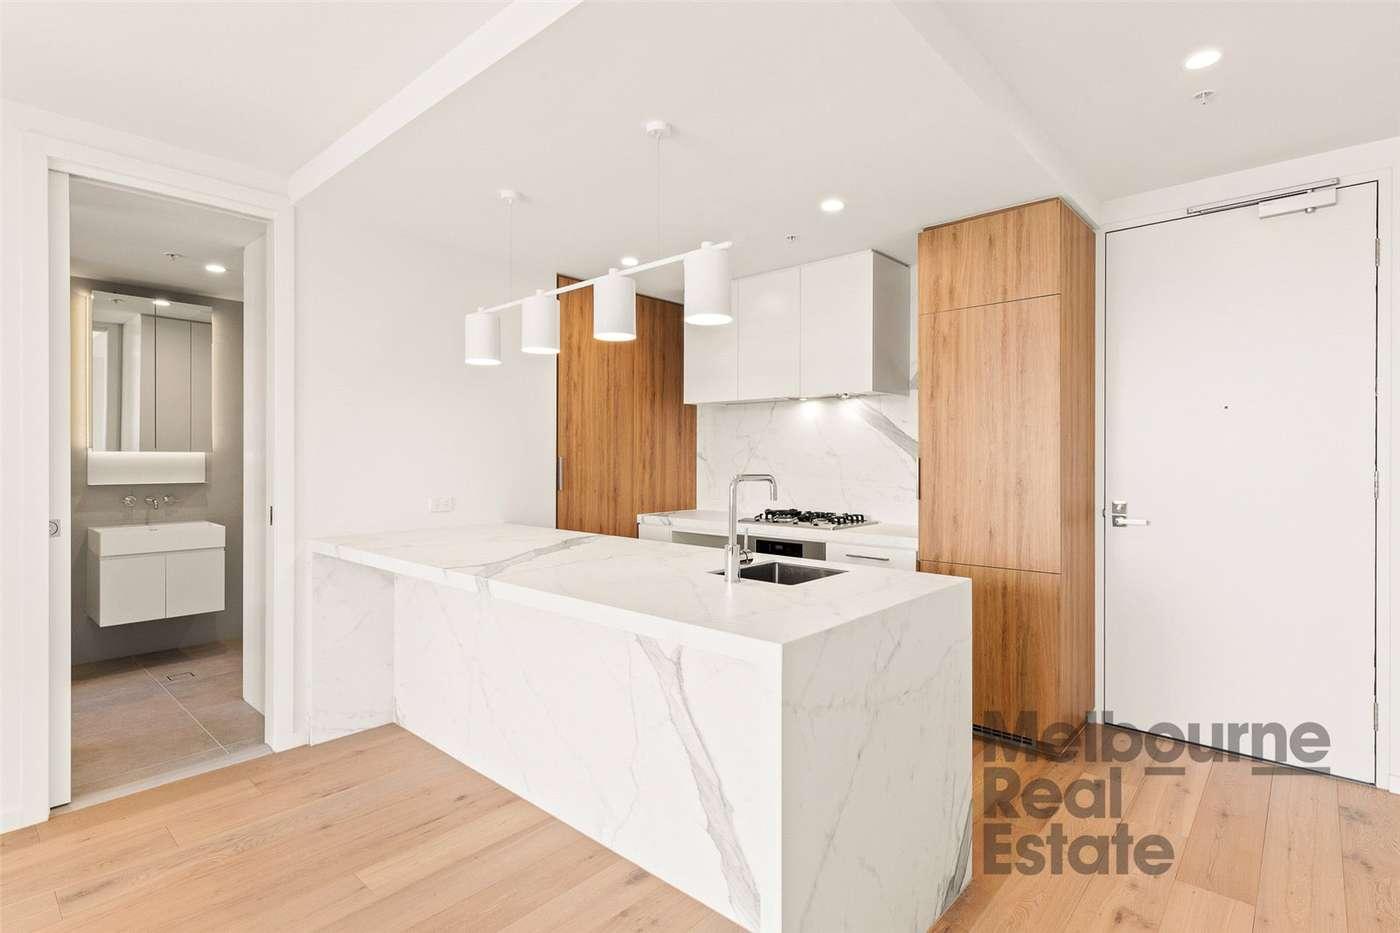 Main view of Homely apartment listing, 204/48 Blenheim Street, Balaclava, VIC 3183